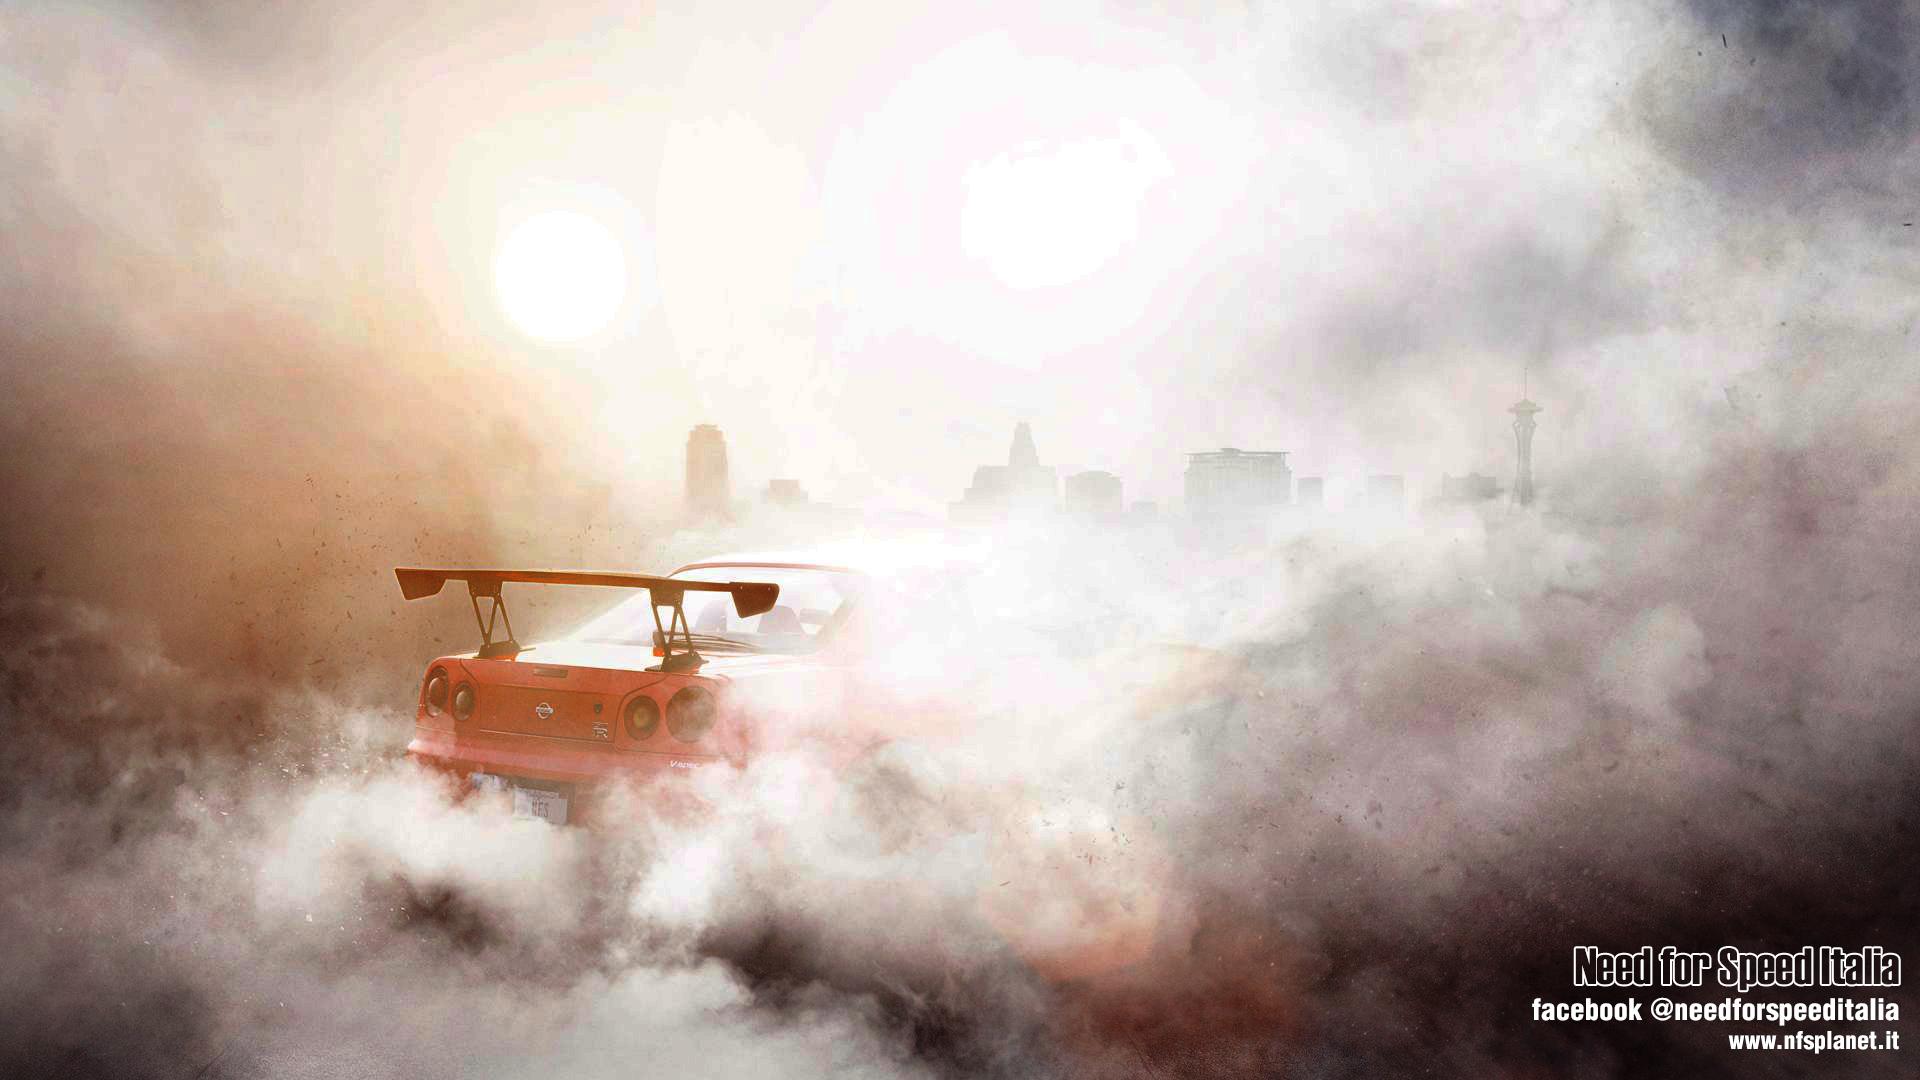 Need-for-speed-2017-Nissan-Skyline